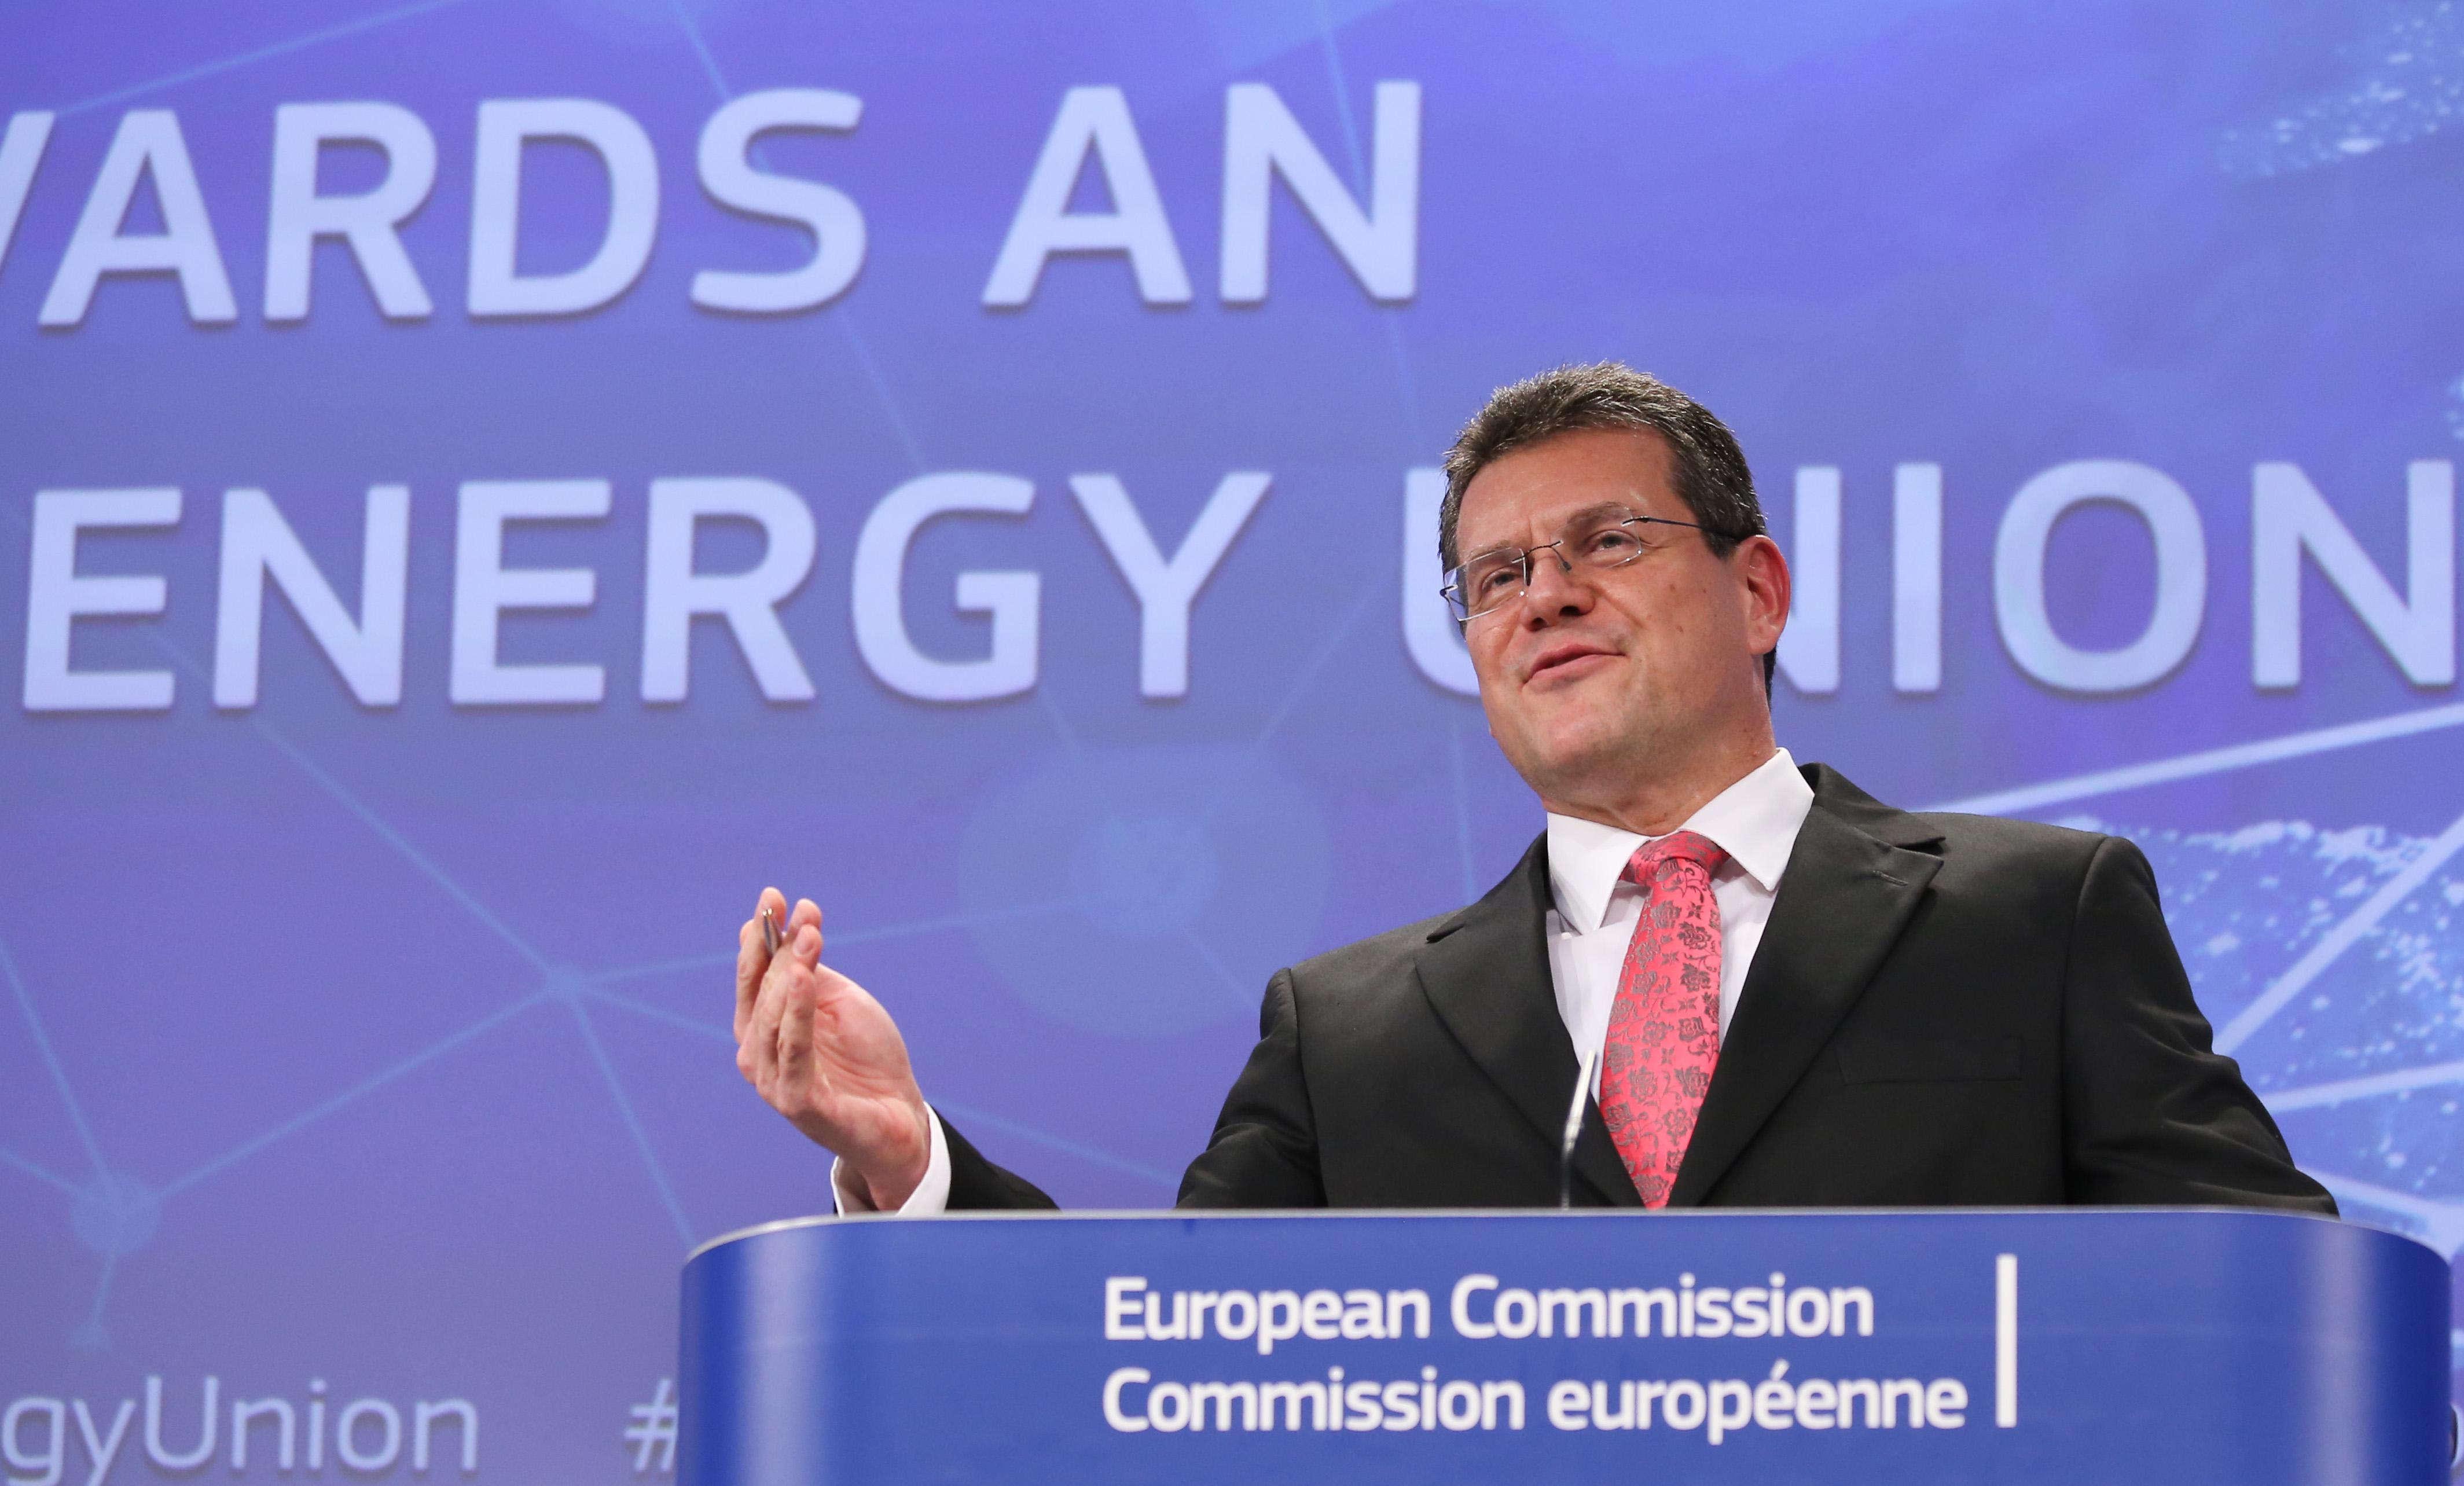 Future enlargement of the European Union